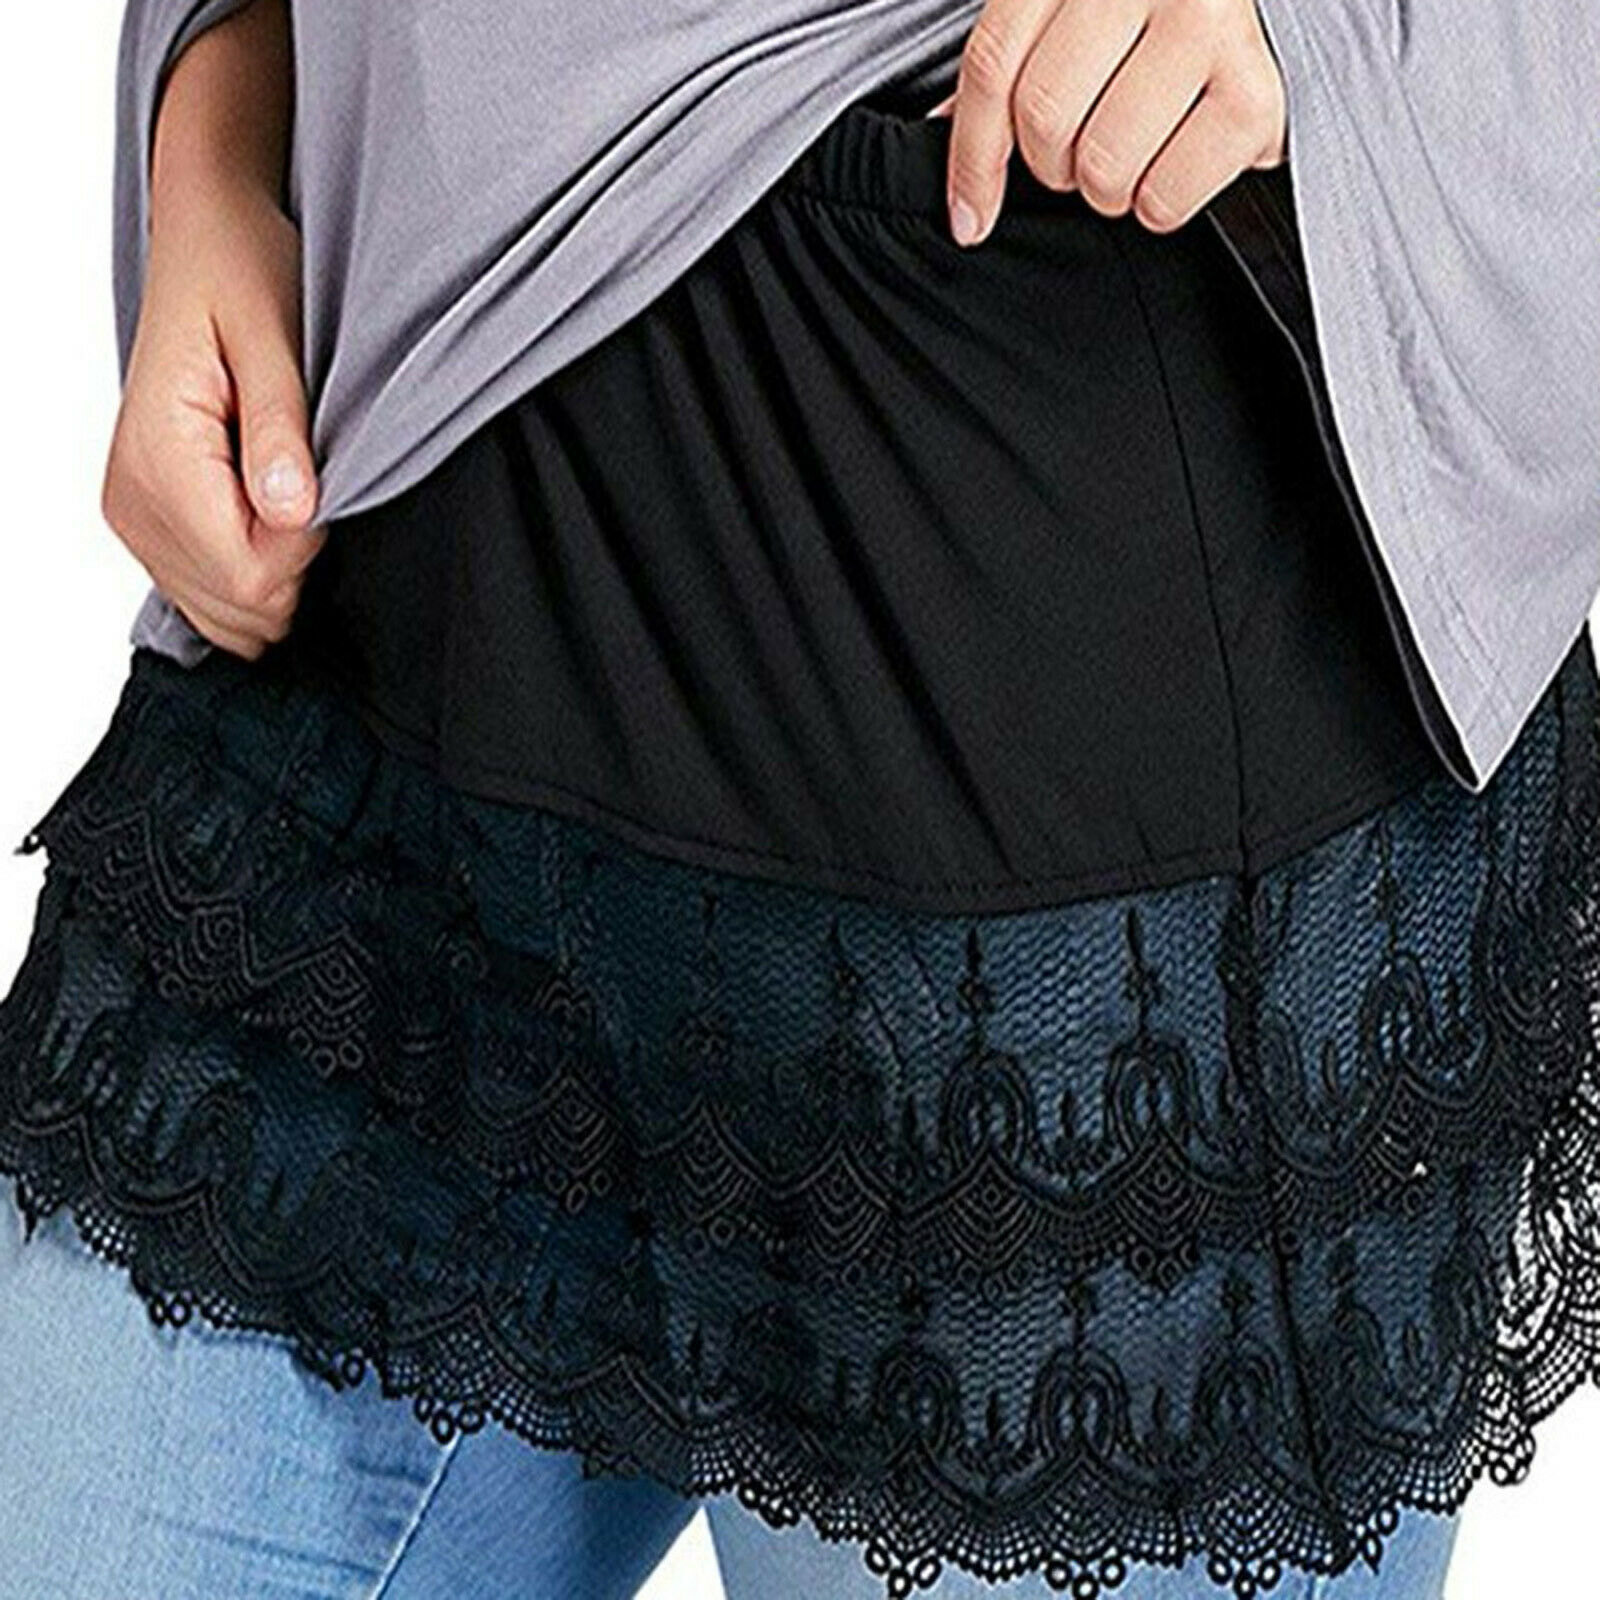 Women Mini Skirt Shirt Extenders Lace Hollow Stitching Short Skirt Accessory